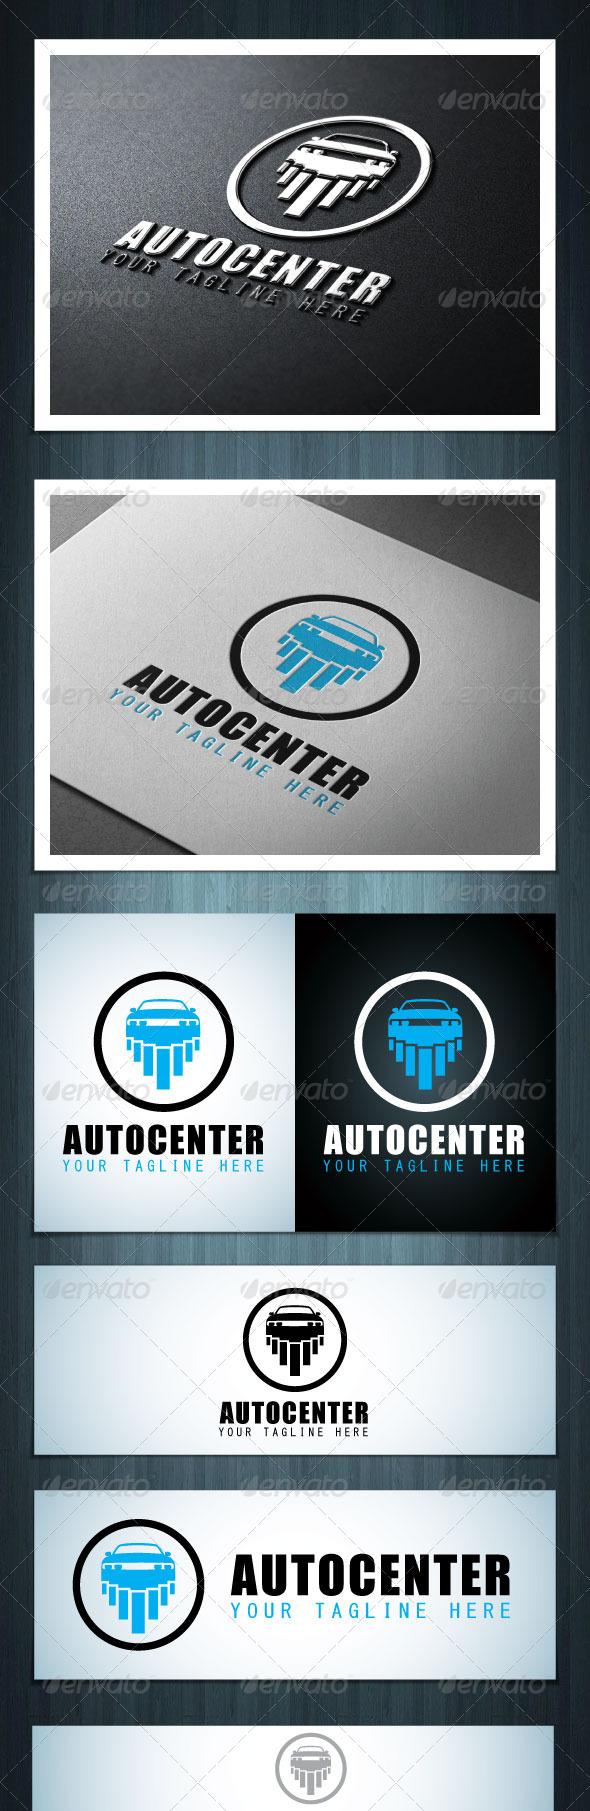 GraphicRiver Autocenter 5041598